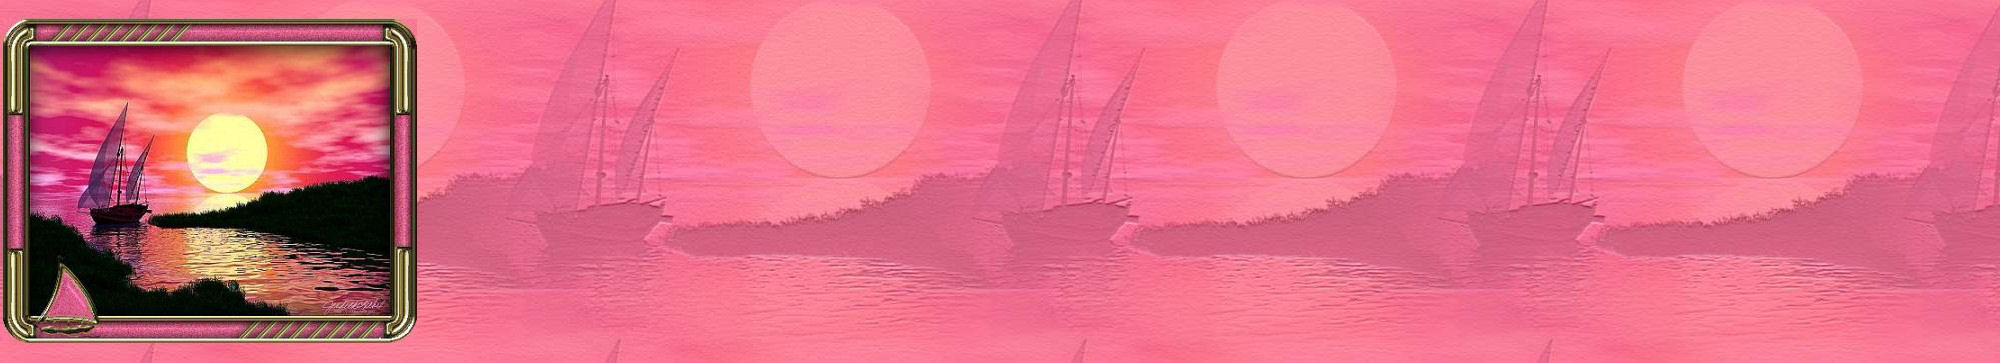 Fondo IM mar_barco_ocaso_003.imf